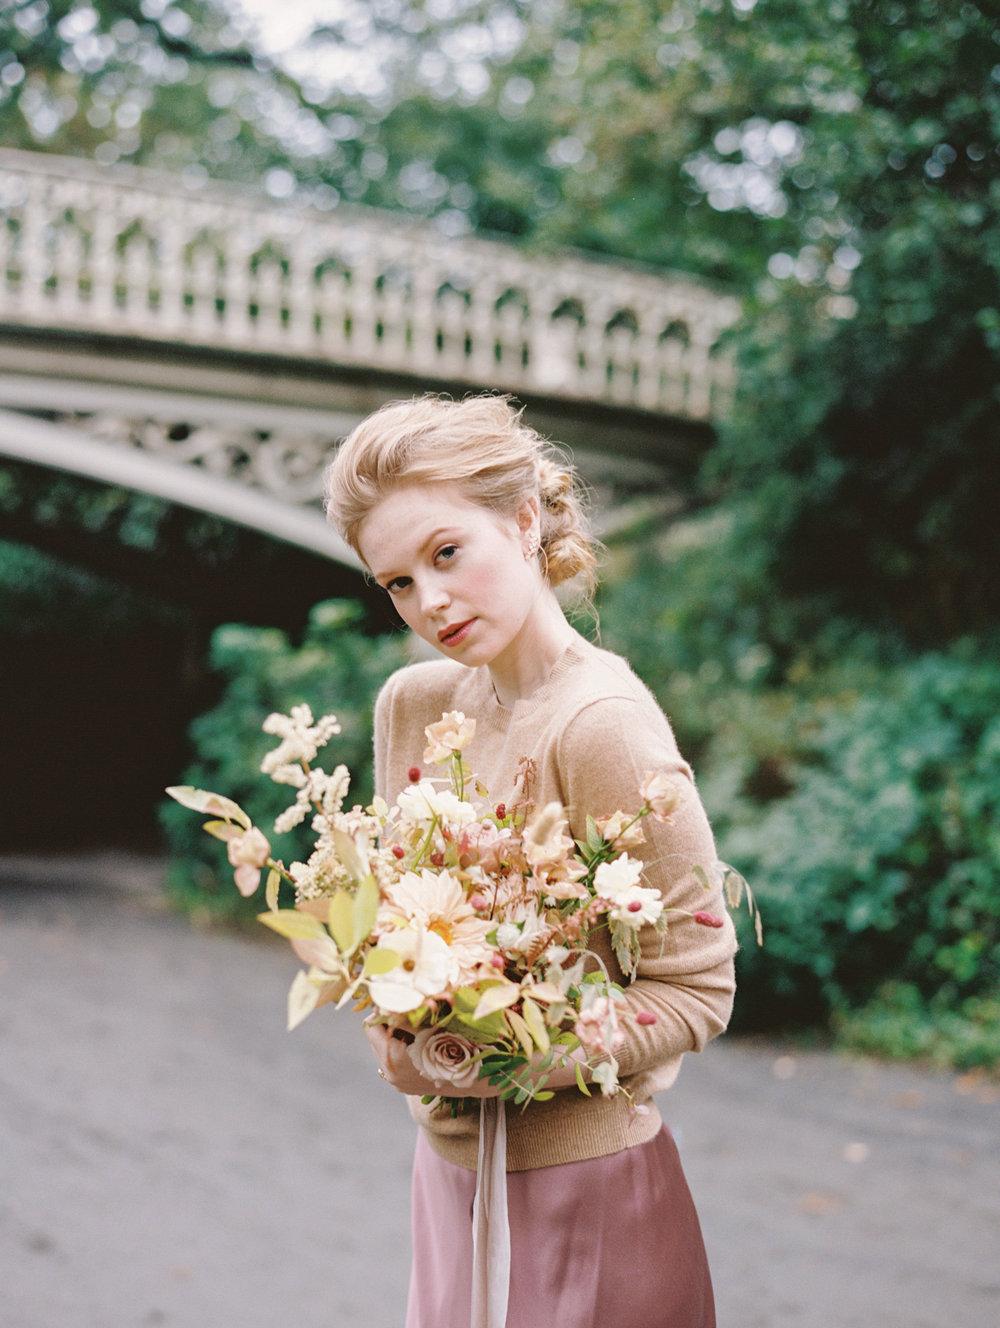 kelsandmichael_bridaleditorial_harvestelopement-109.jpg